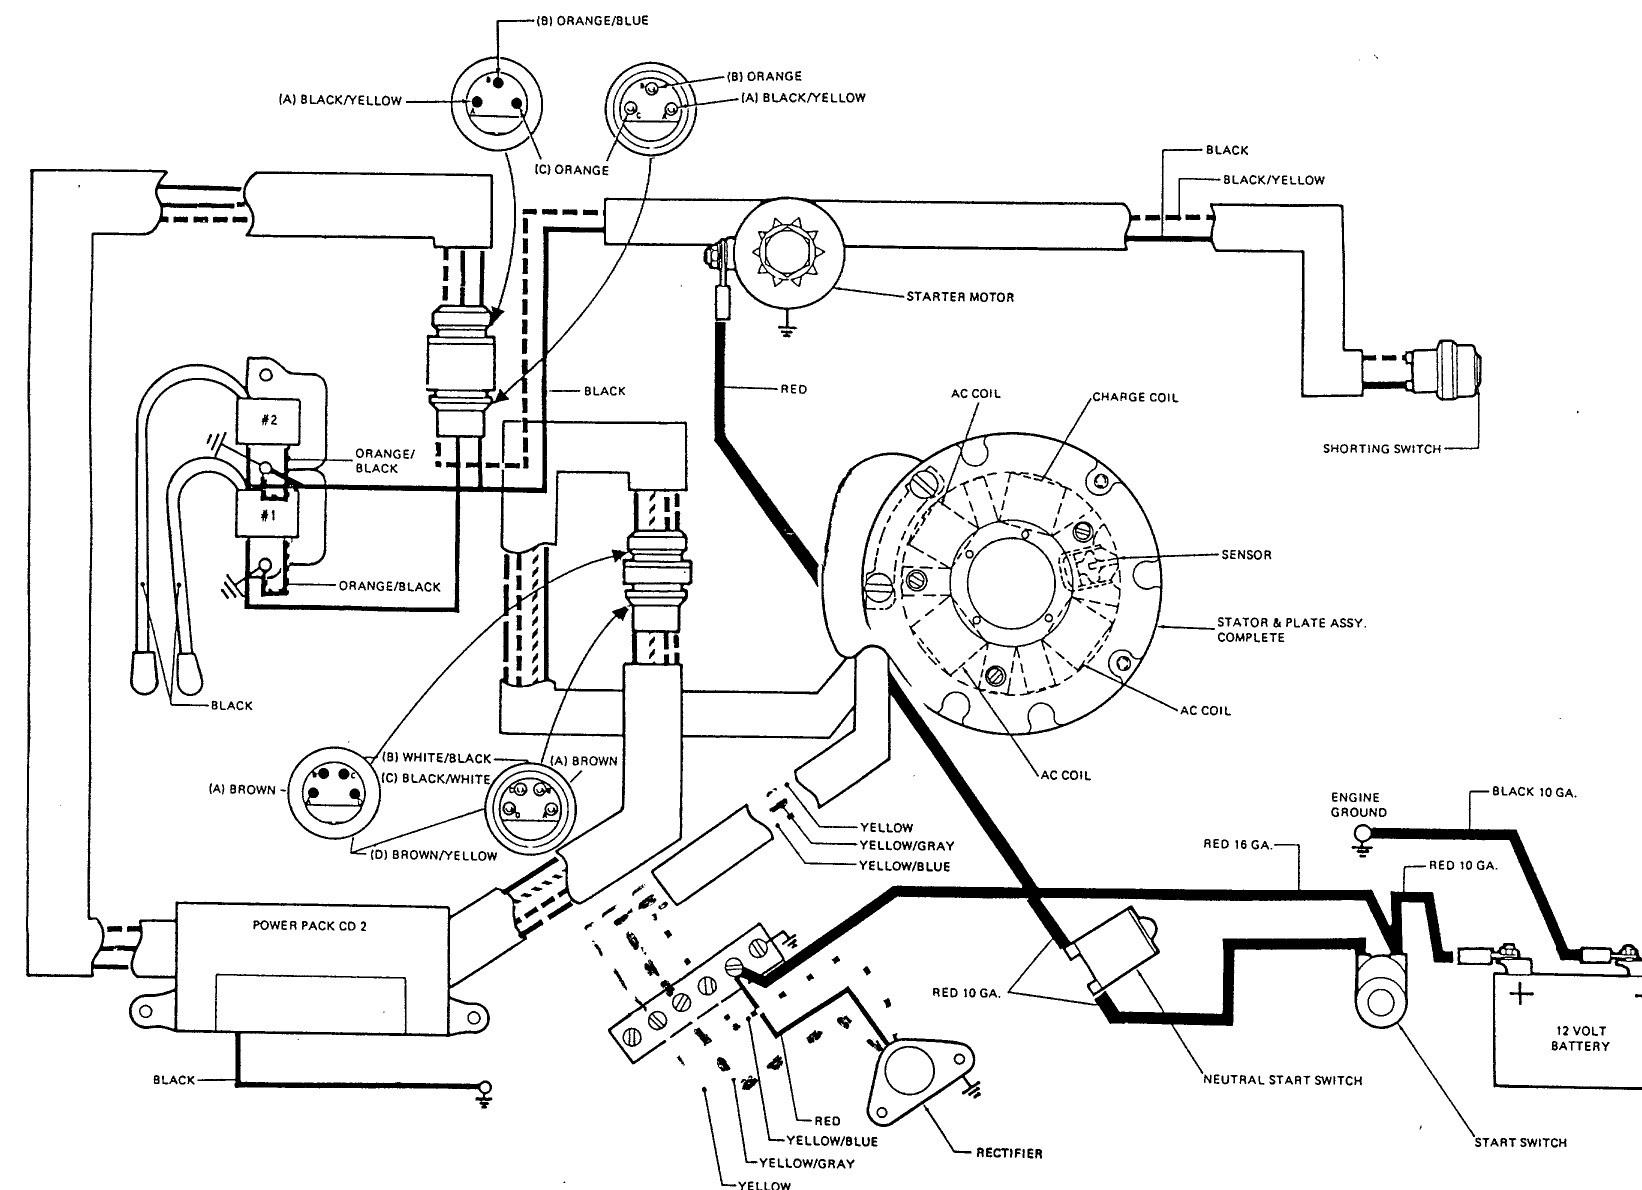 15 Hp Evinrude Parts Diagram Maintaining Johnson 9 9 Troubleshooting Of 15 Hp Evinrude Parts Diagram